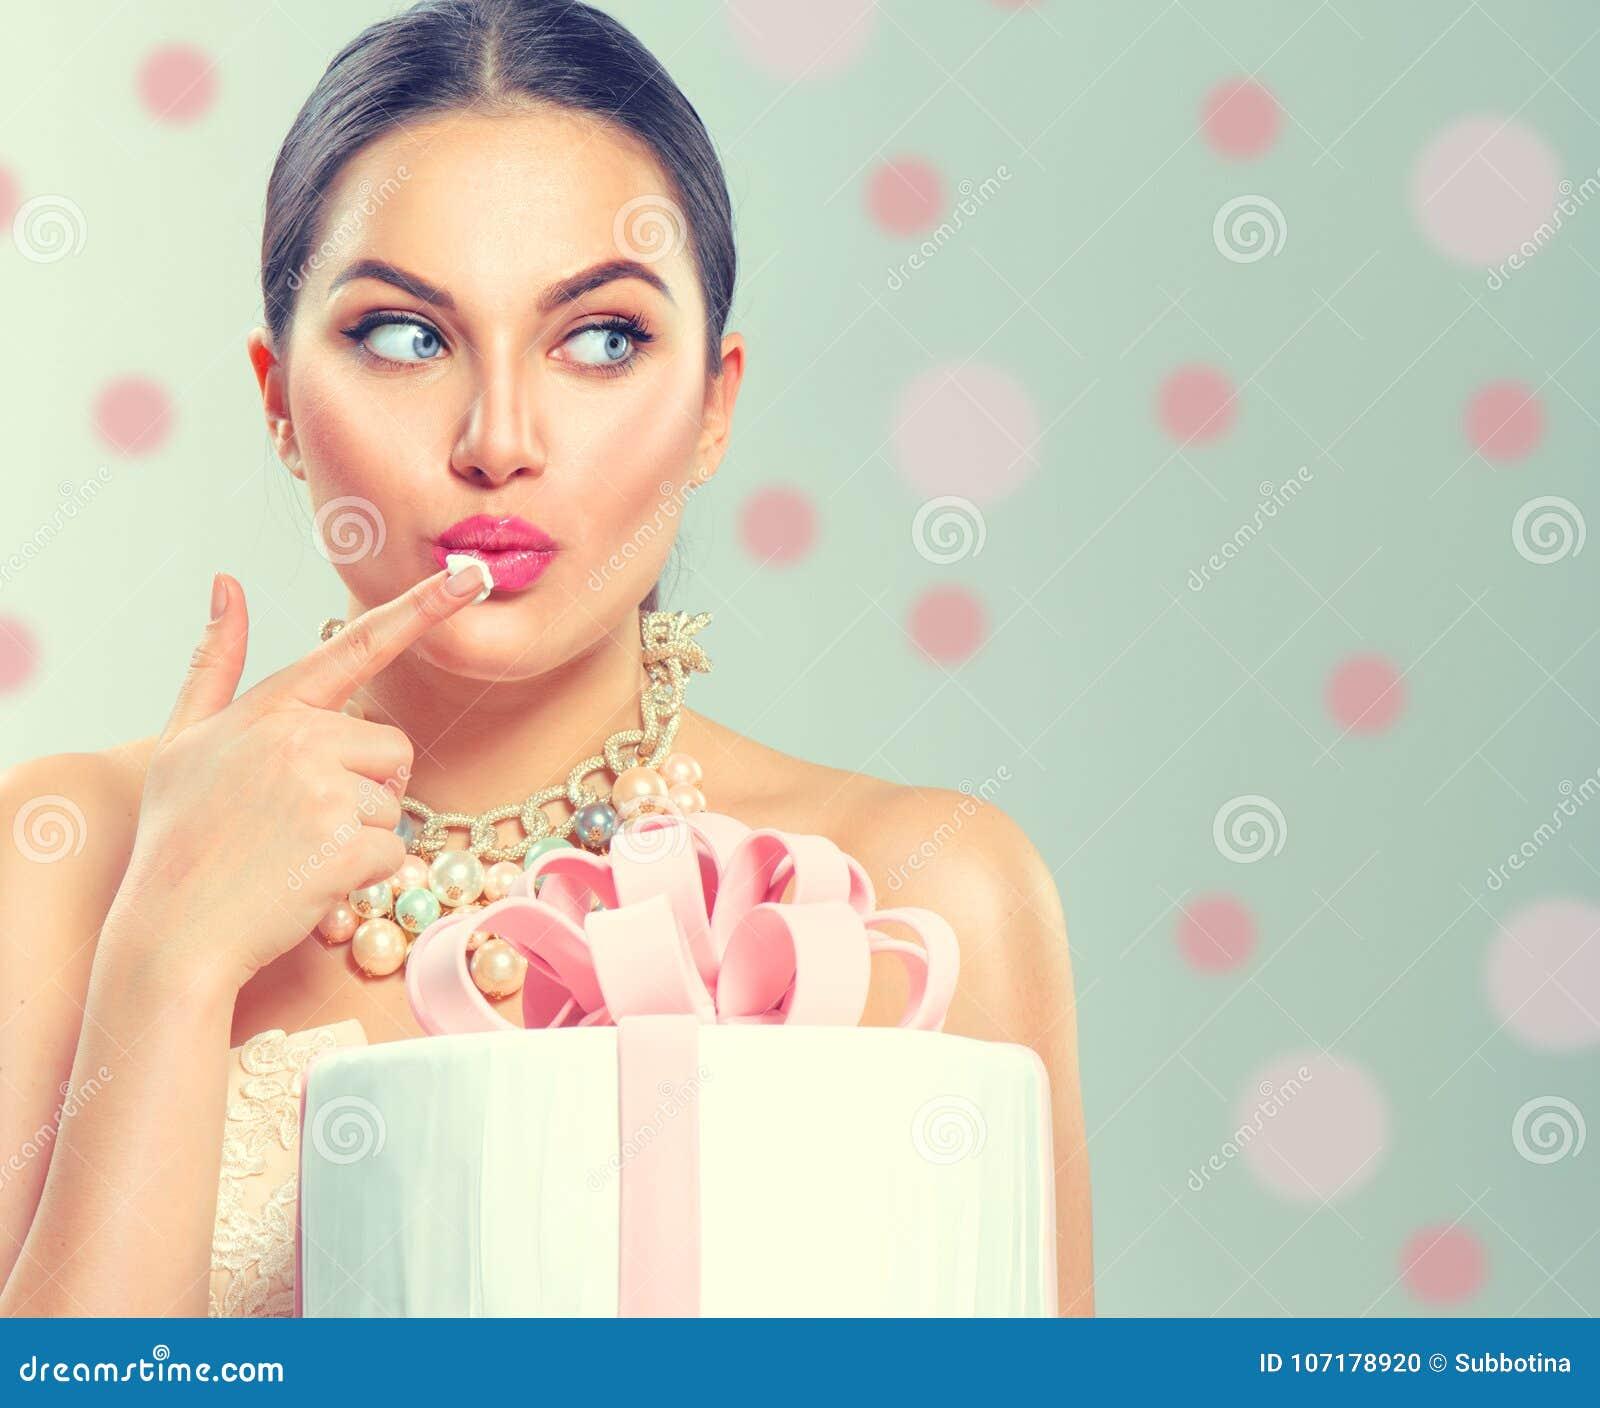 Funny joyful beauty model girl holding big beautiful party or birthday cake